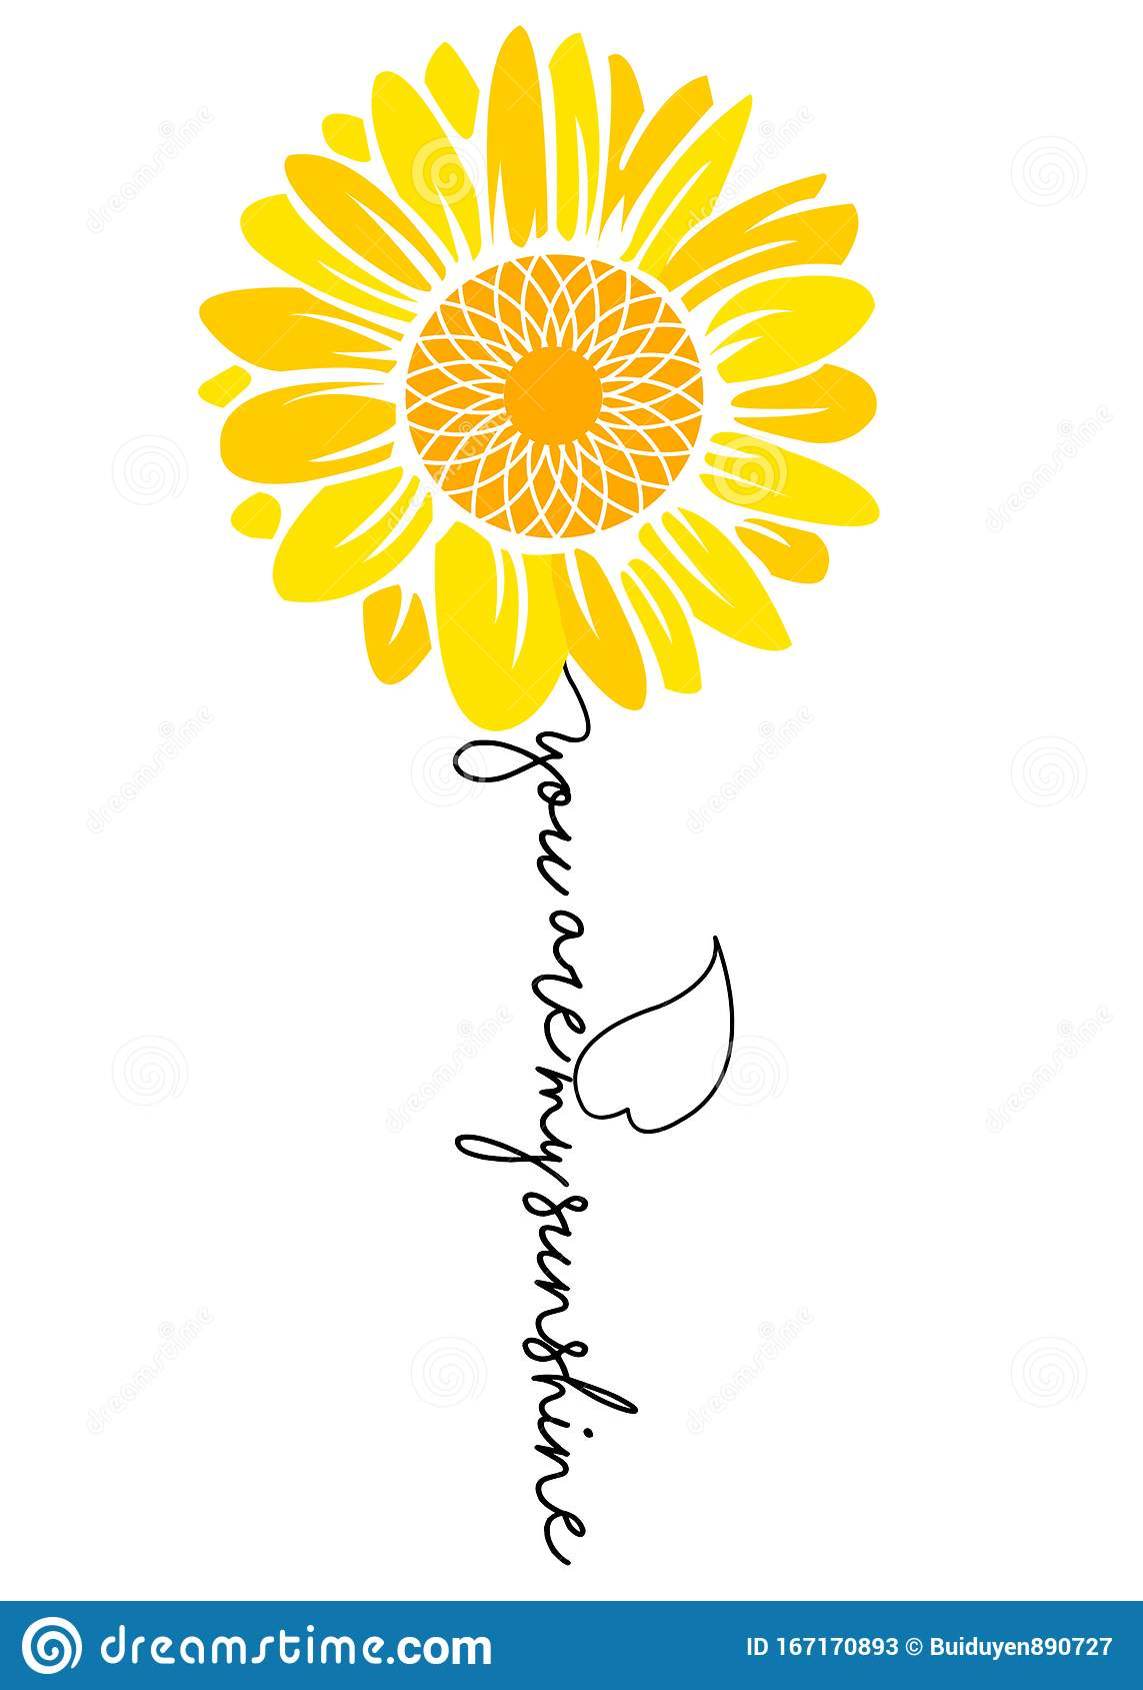 Sunflower You Are My Sunshine Stock Image Image Of Decorative Aquarelle 167170893